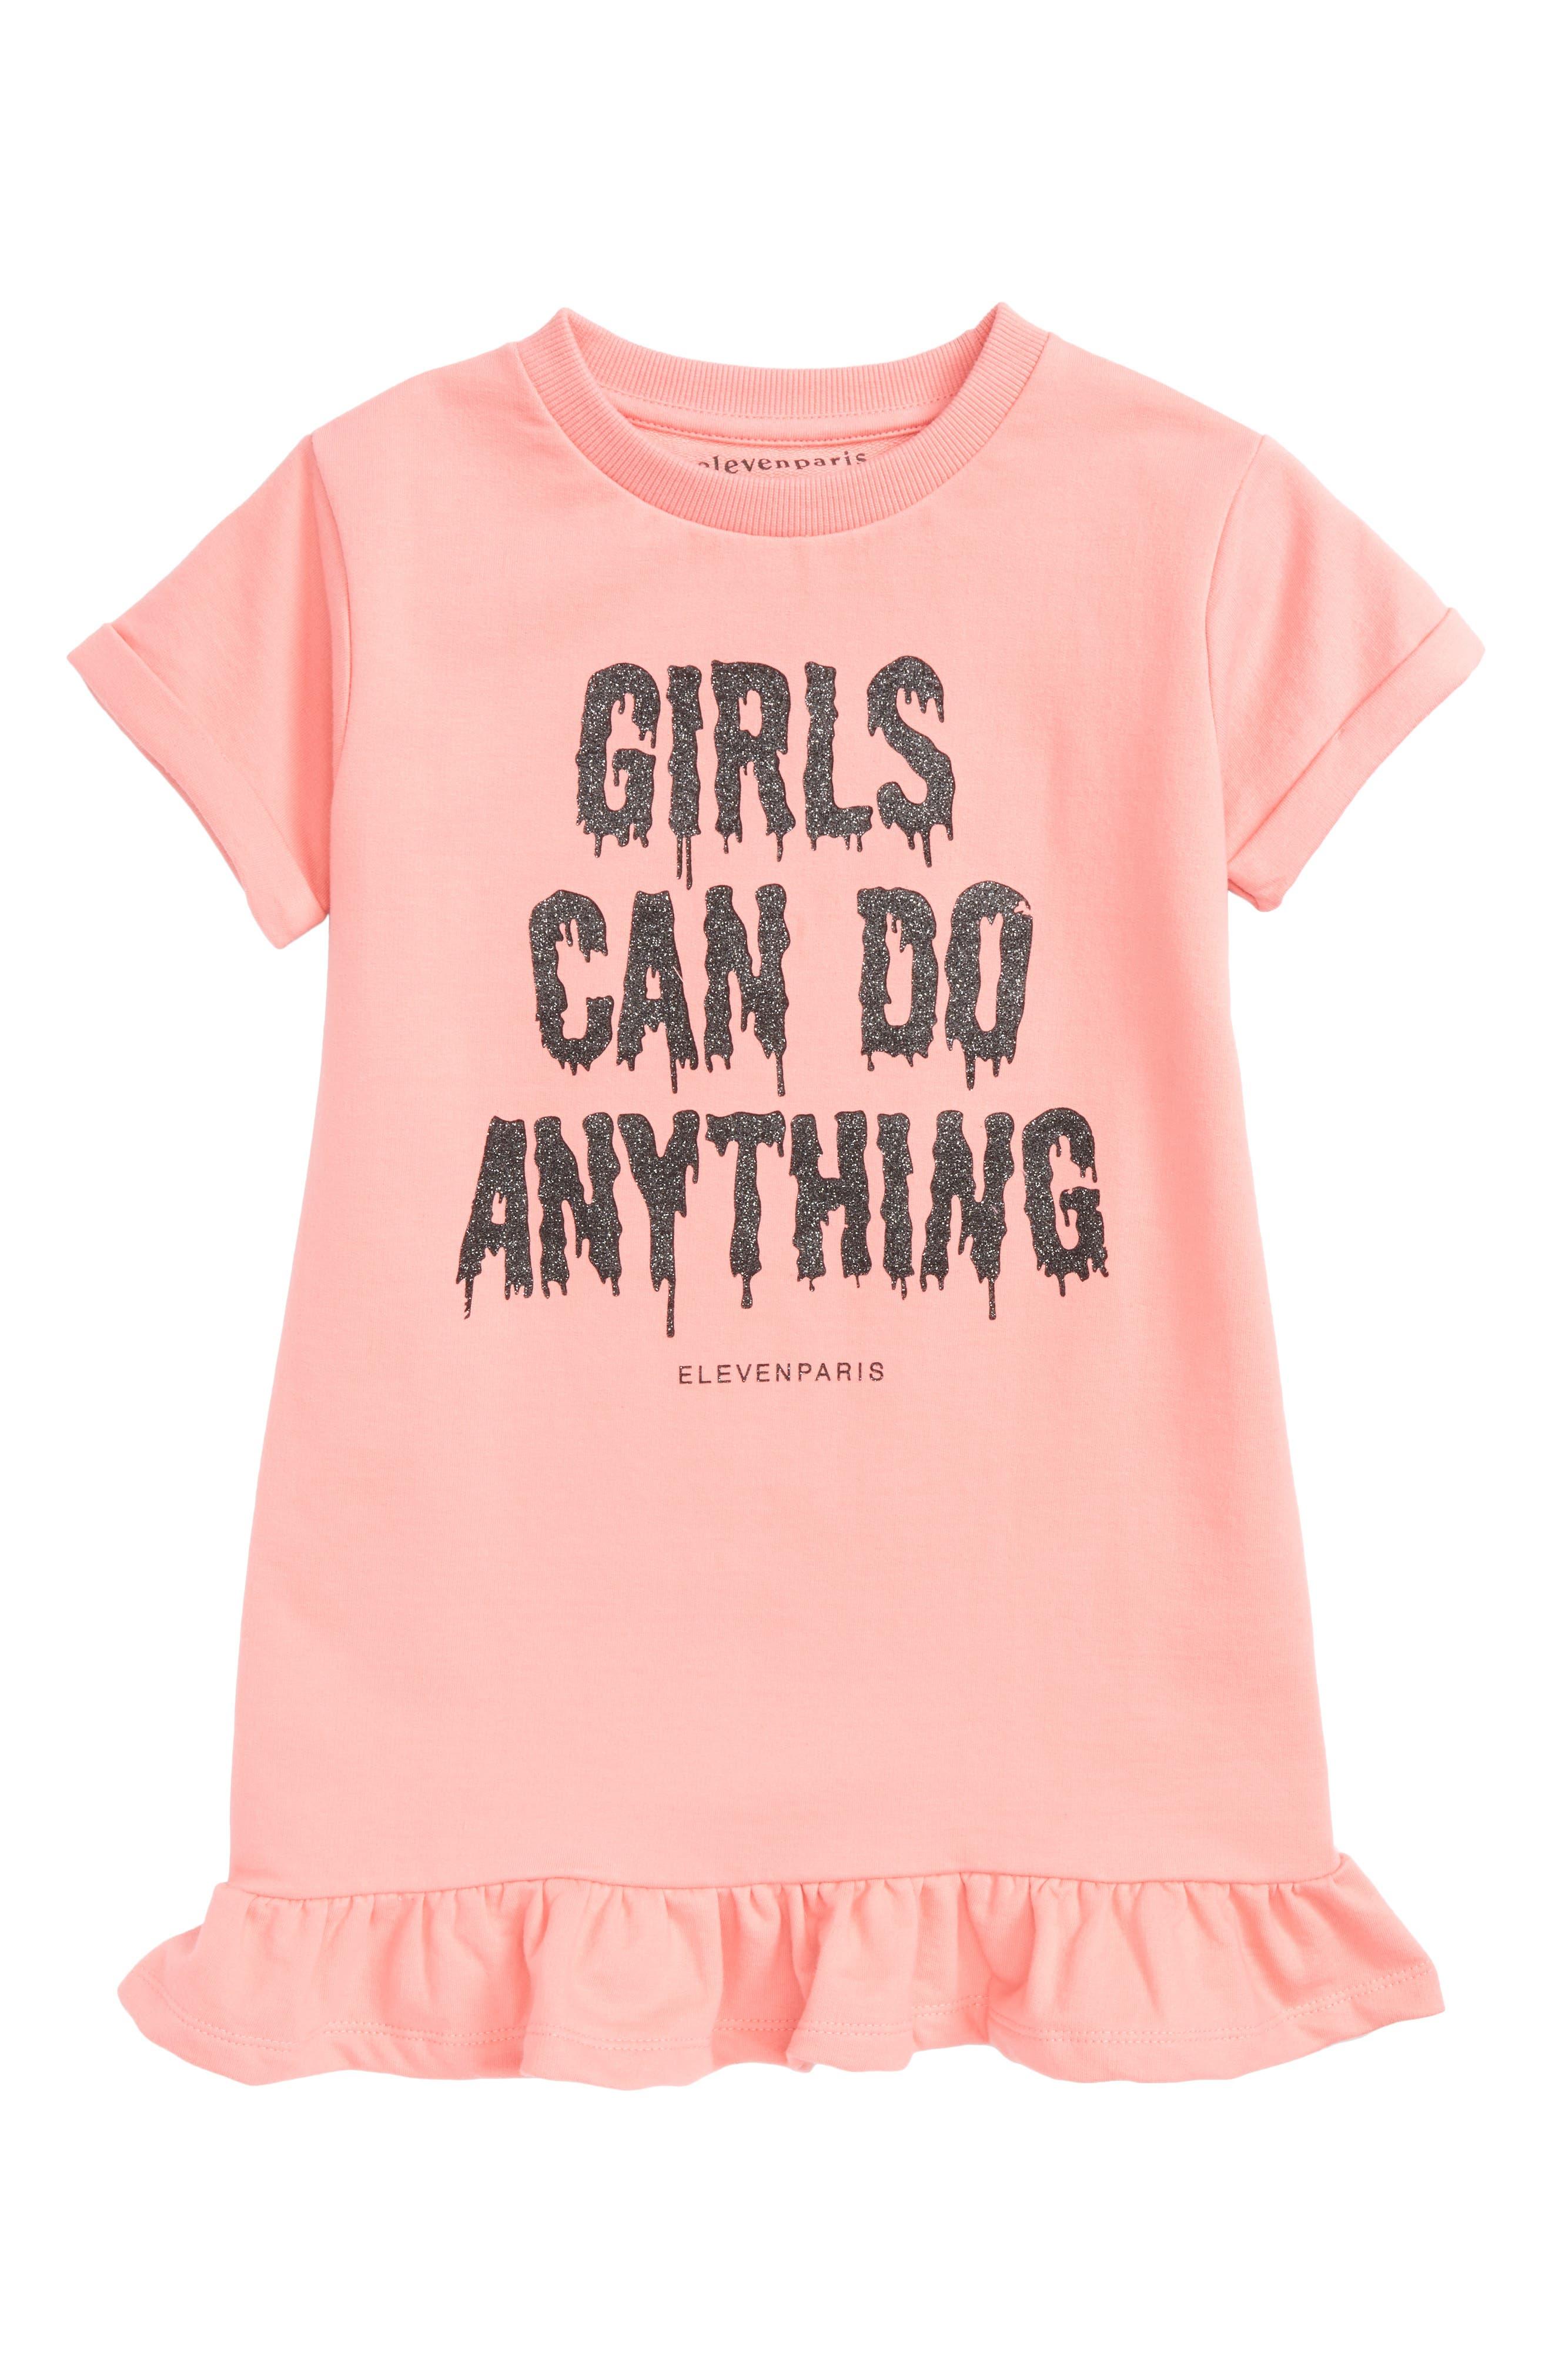 Little ELEVENPARIS Girls Can Do Anything Graphic Dress (Little Girls & Big Girls)